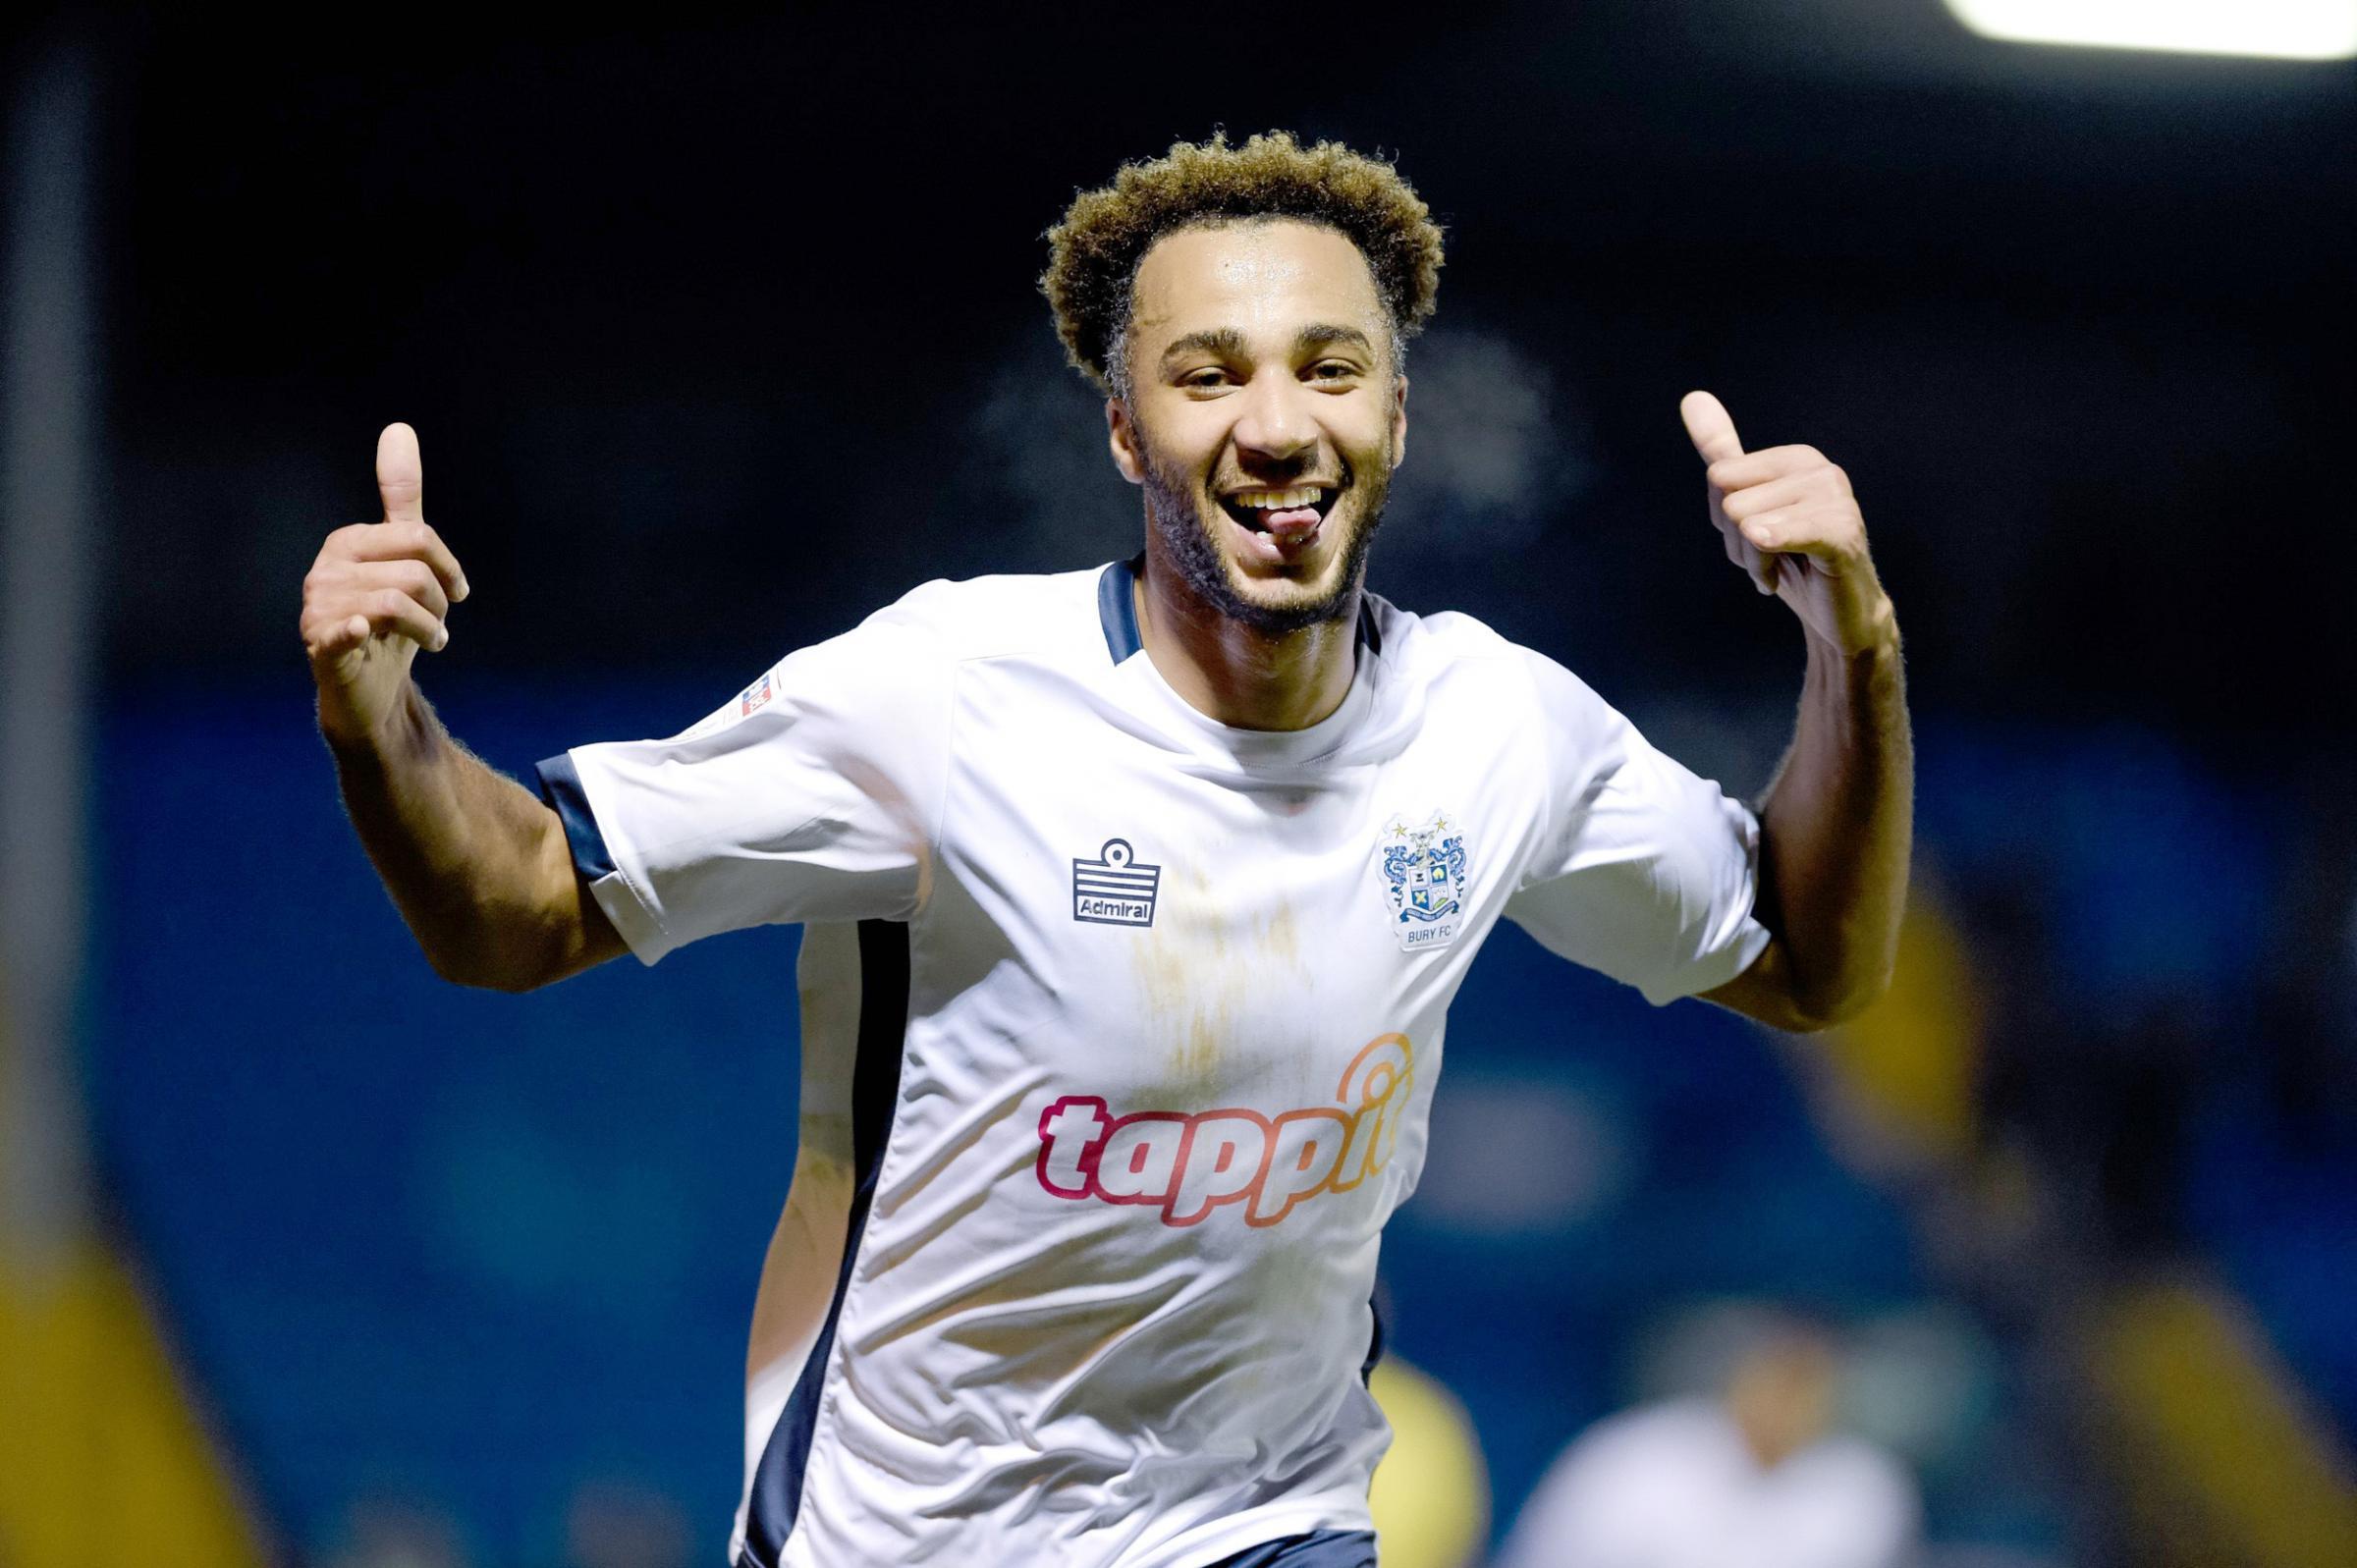 We've got goalscorers throughout the team, says Bury FC captain Neil Danns